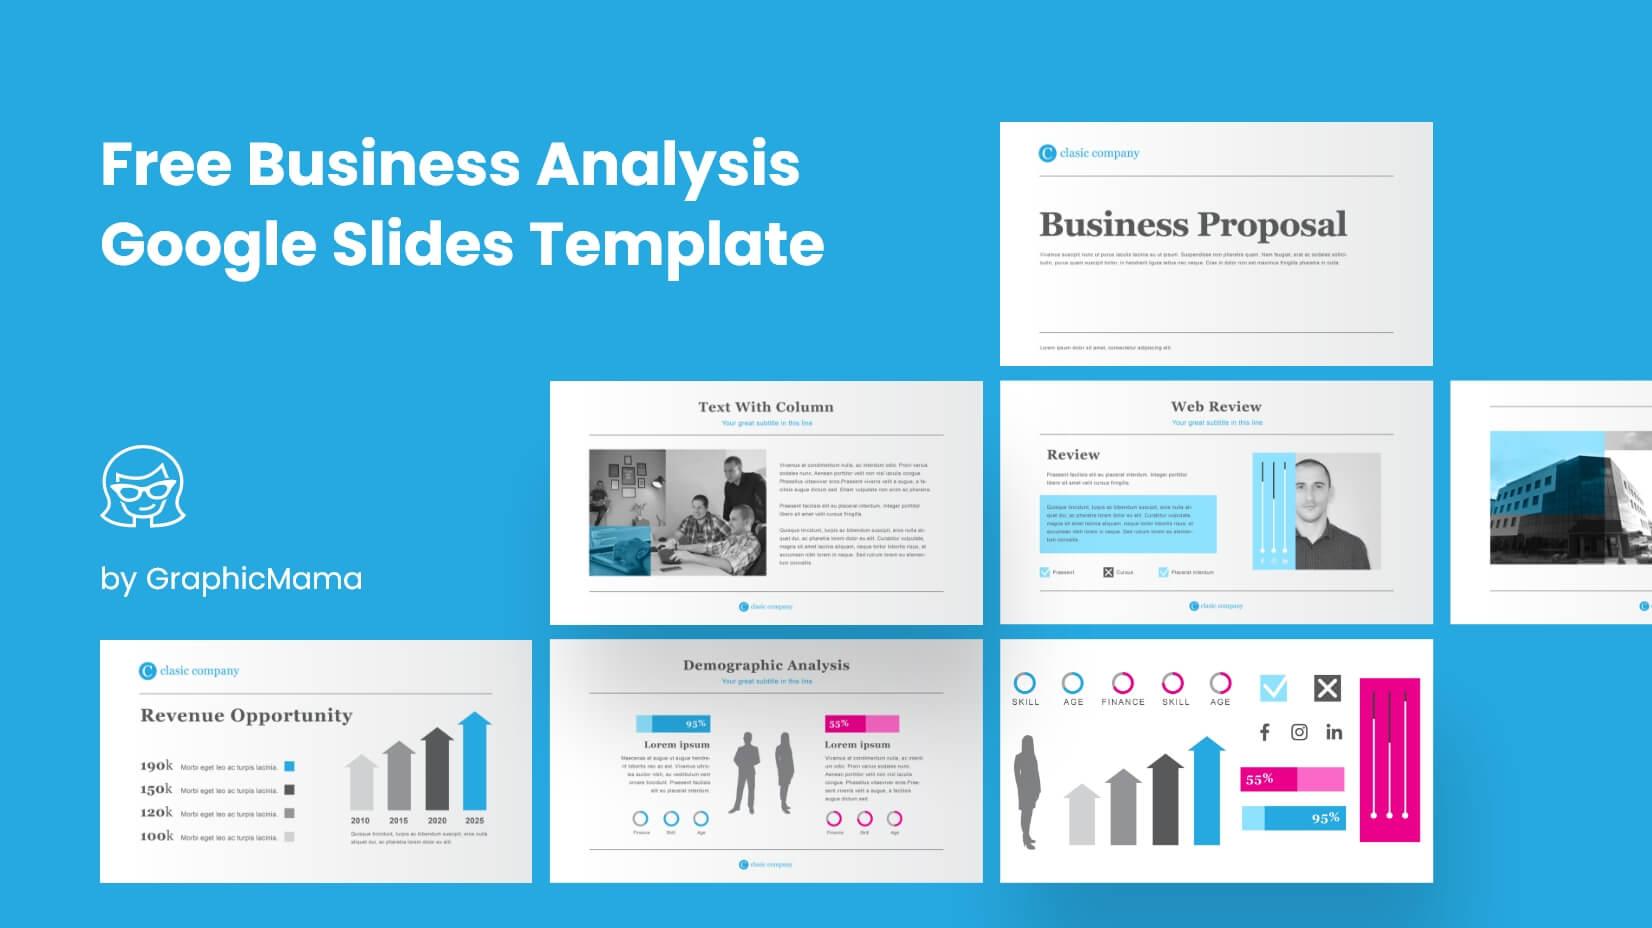 Free-Business-Analysis-Google-Slides-Template.